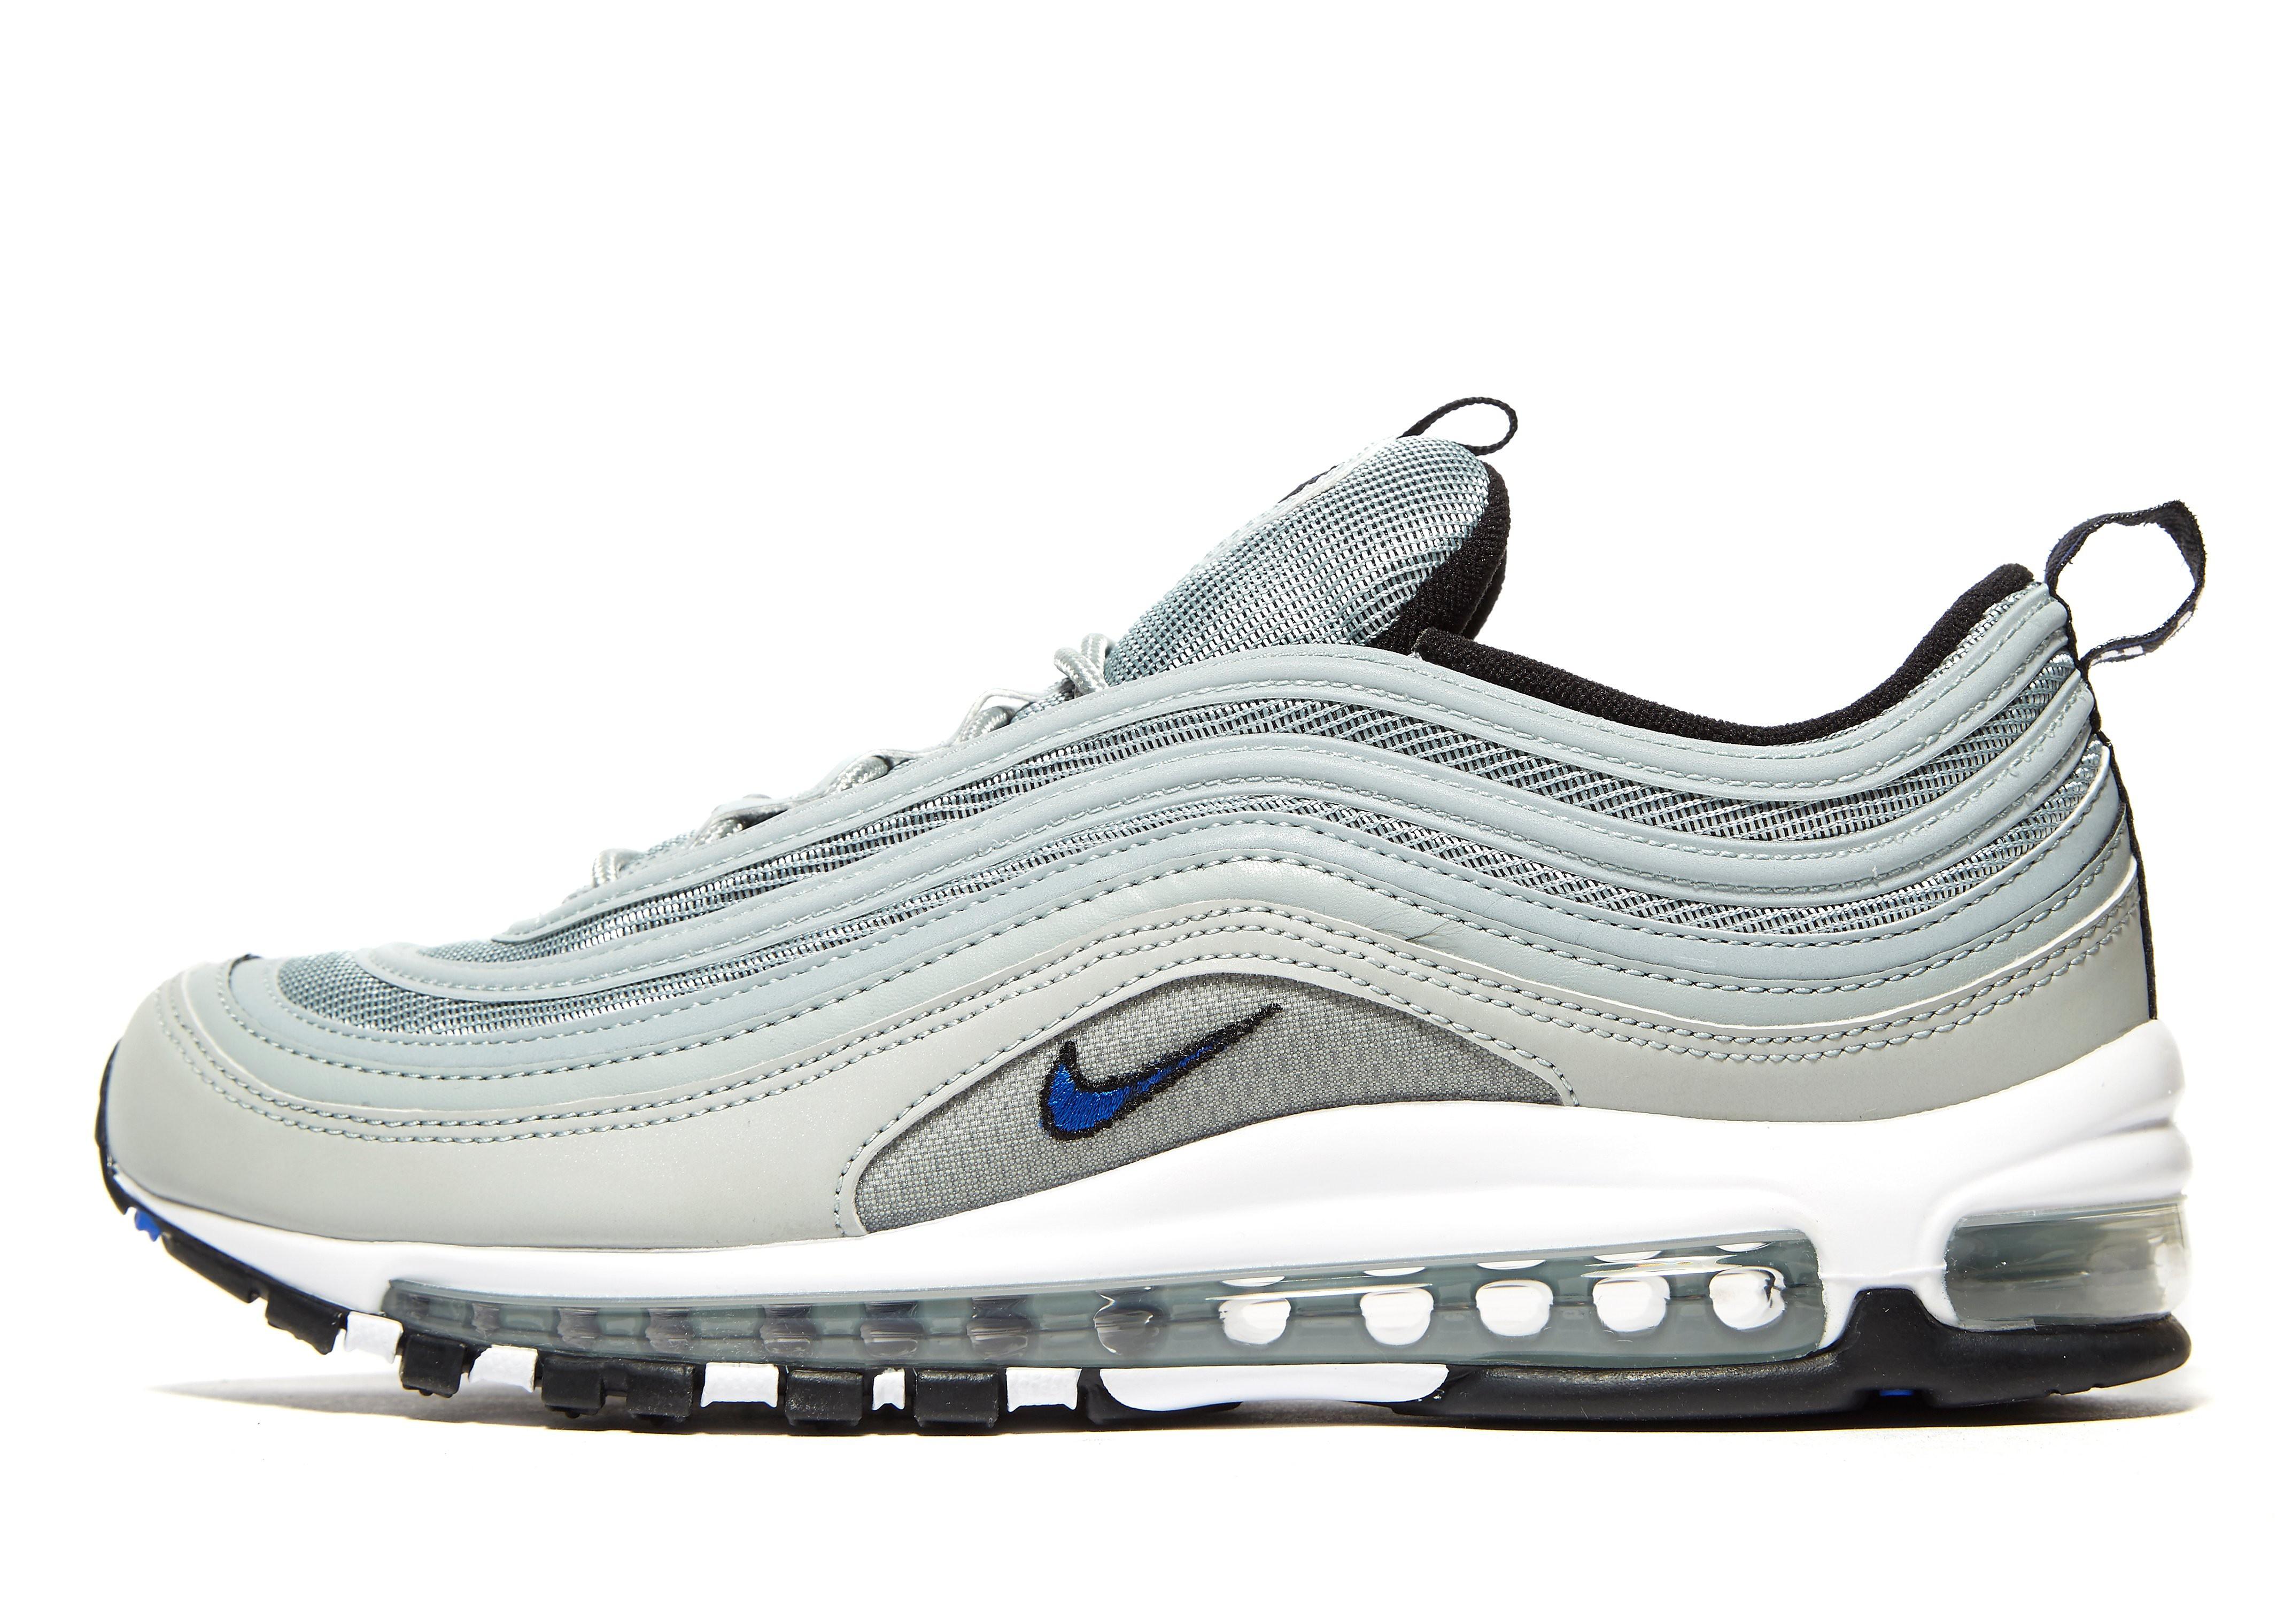 Nike Air Max 97 OG